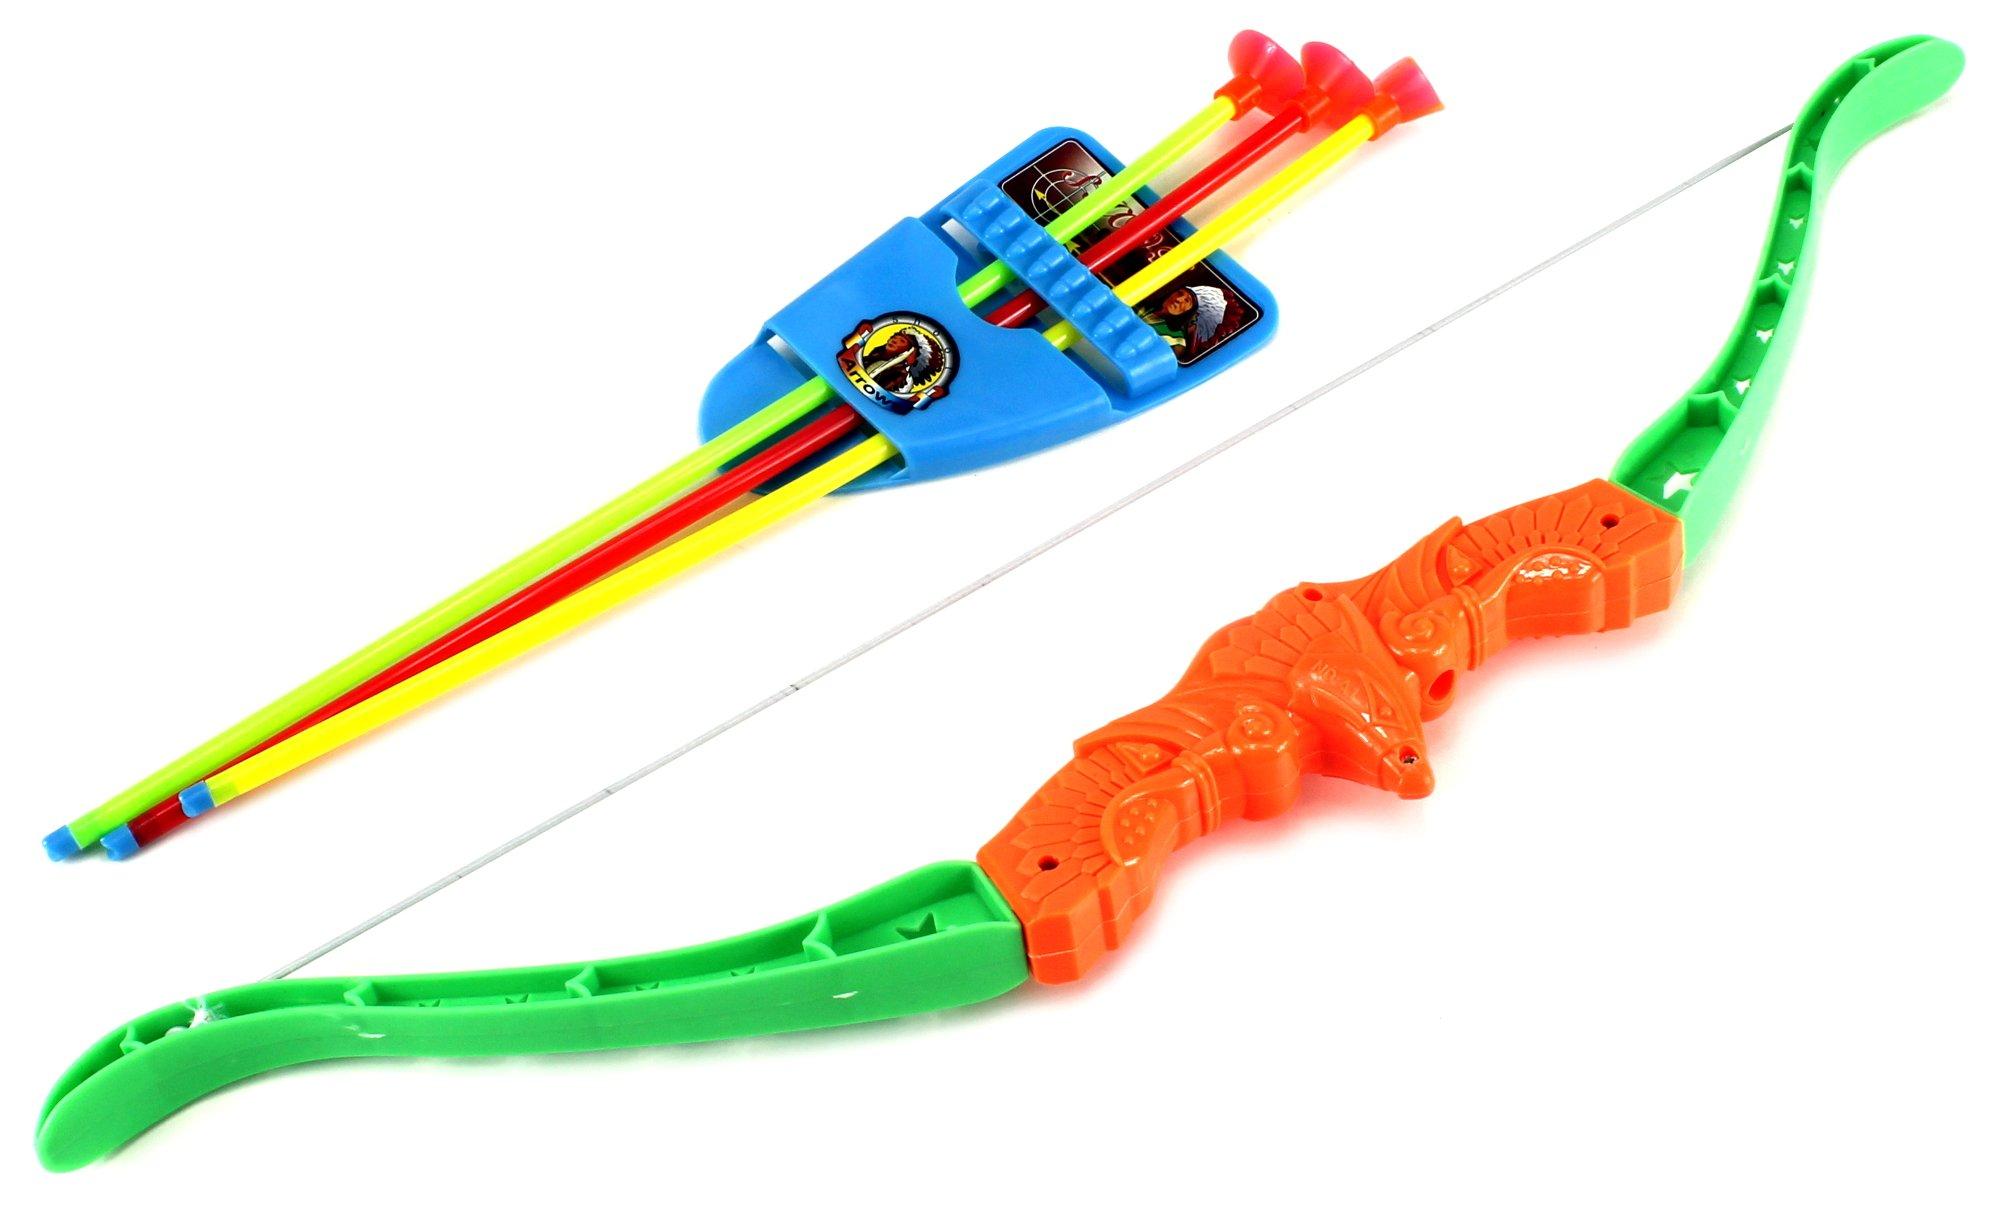 Arrow Eagle Archery Children's Kid's Toy Bow and Arrow Dart Playset w/ Suction Dart Arrows